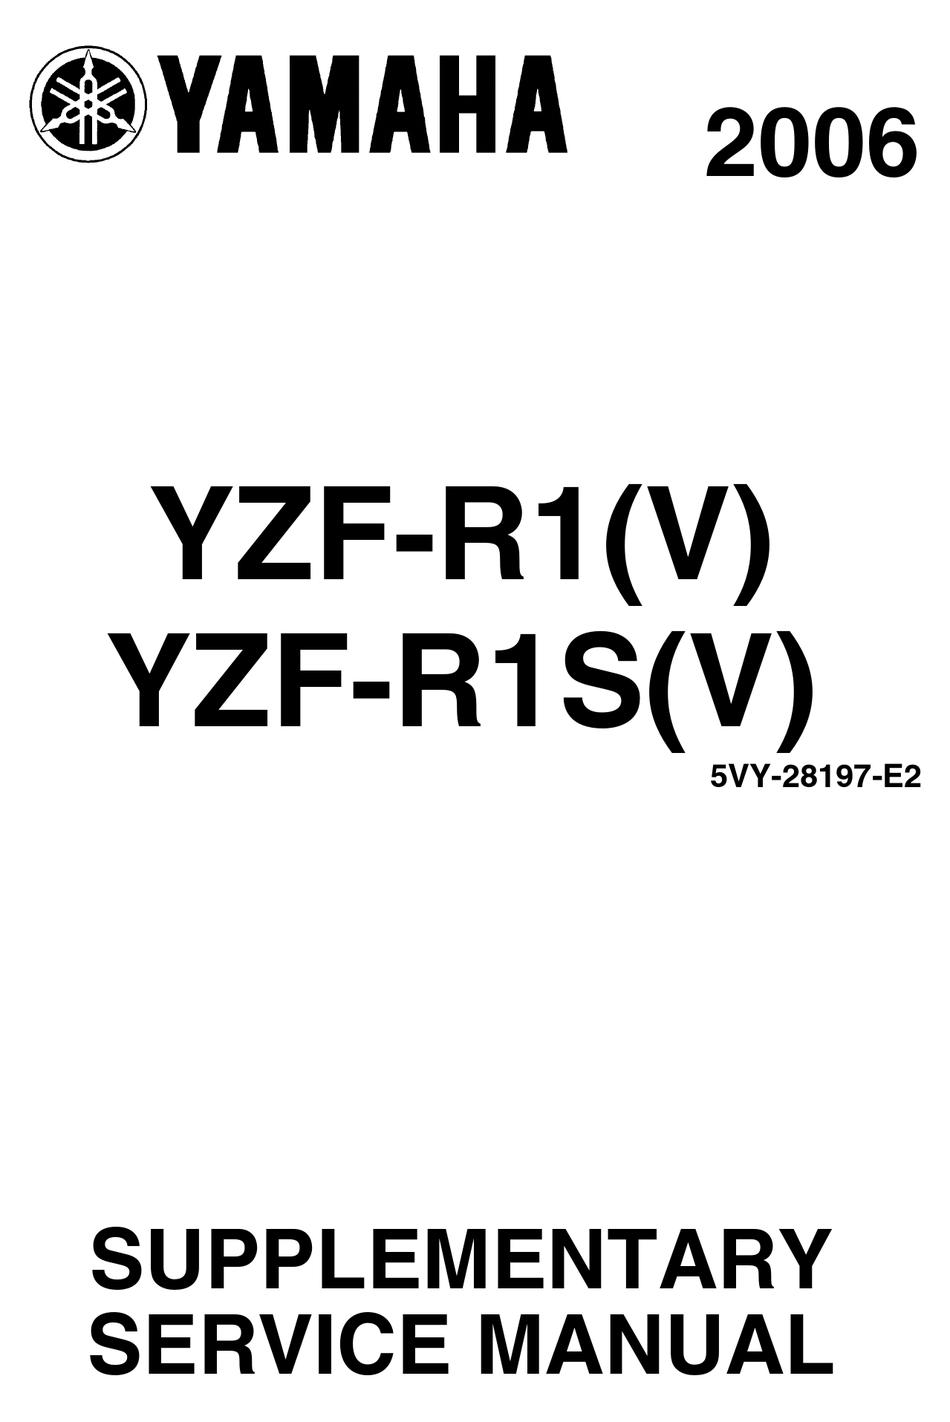 Yamaha 2006 Ysf R1 V Supplementary Service Manual Pdf Download Manualslib